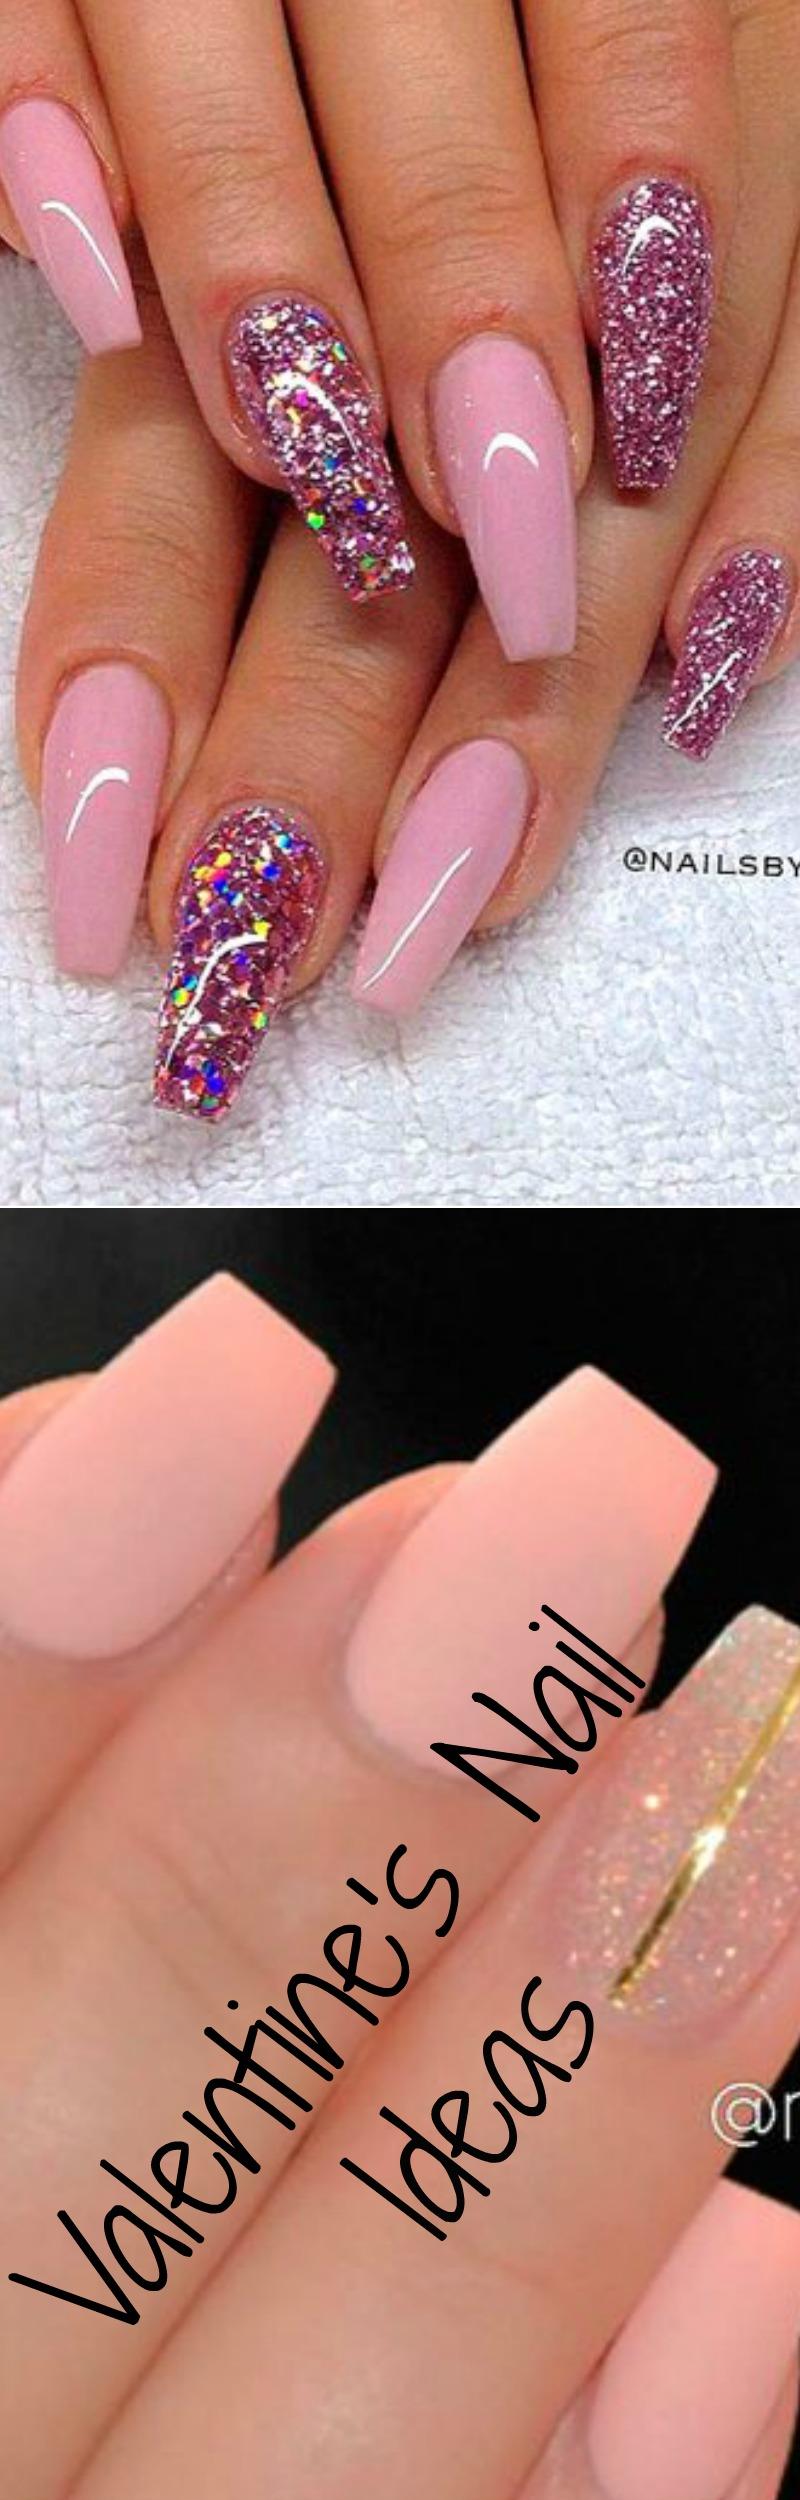 pink nails designs - 17 Pink Nail Designs You'll Want To Copy